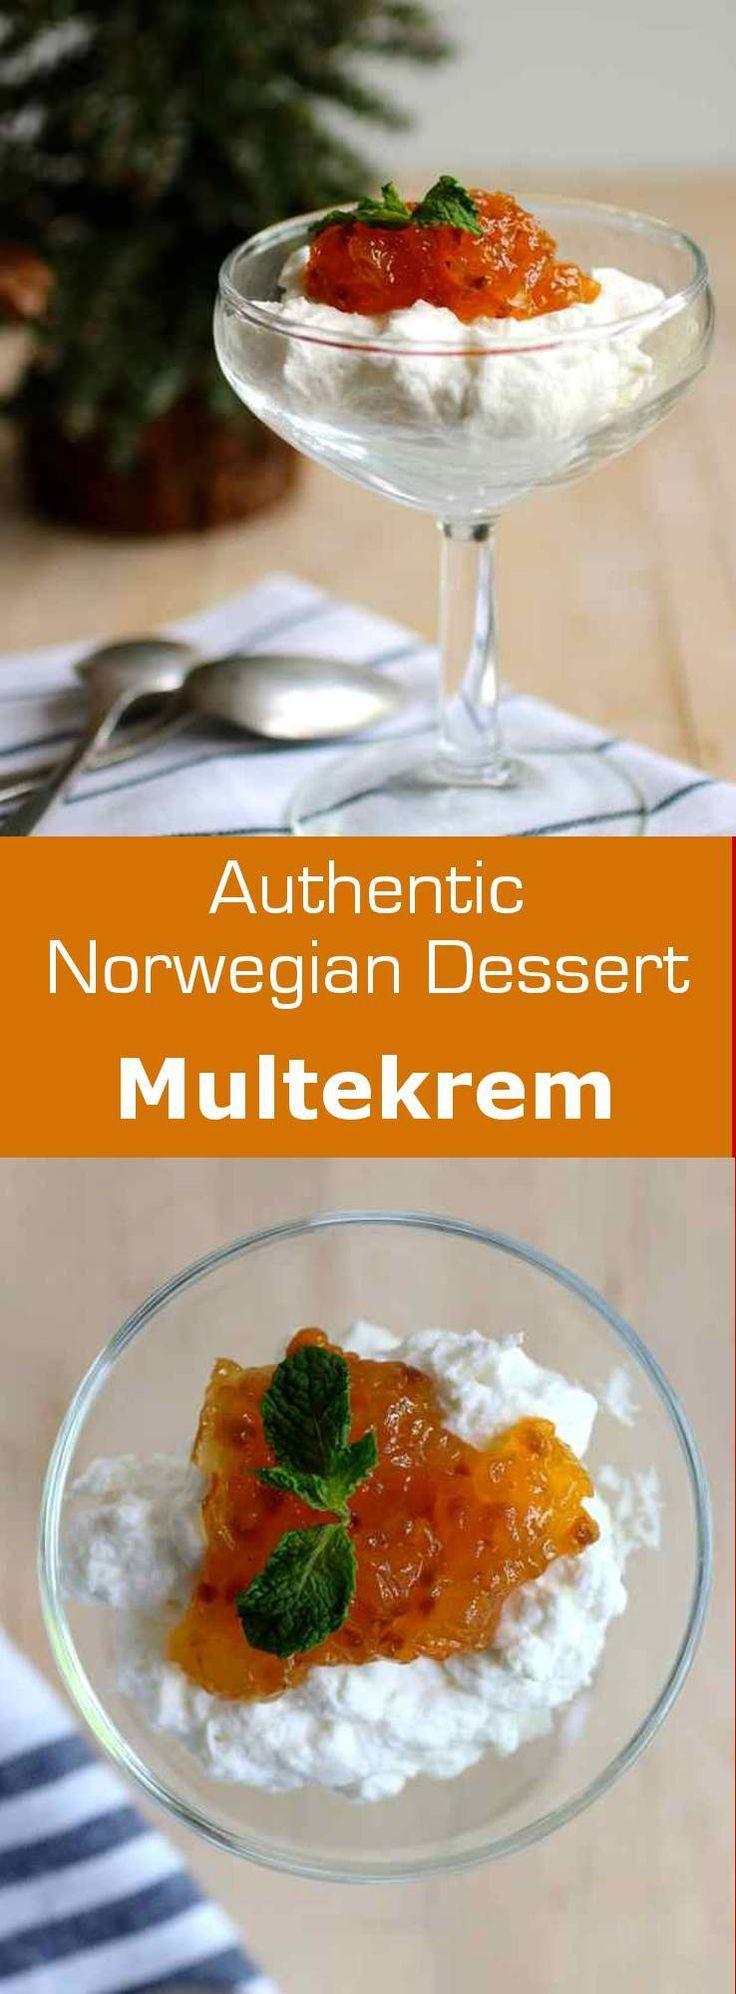 Norwegian Christmas Desserts  Best 25 Norwegian recipes ideas on Pinterest